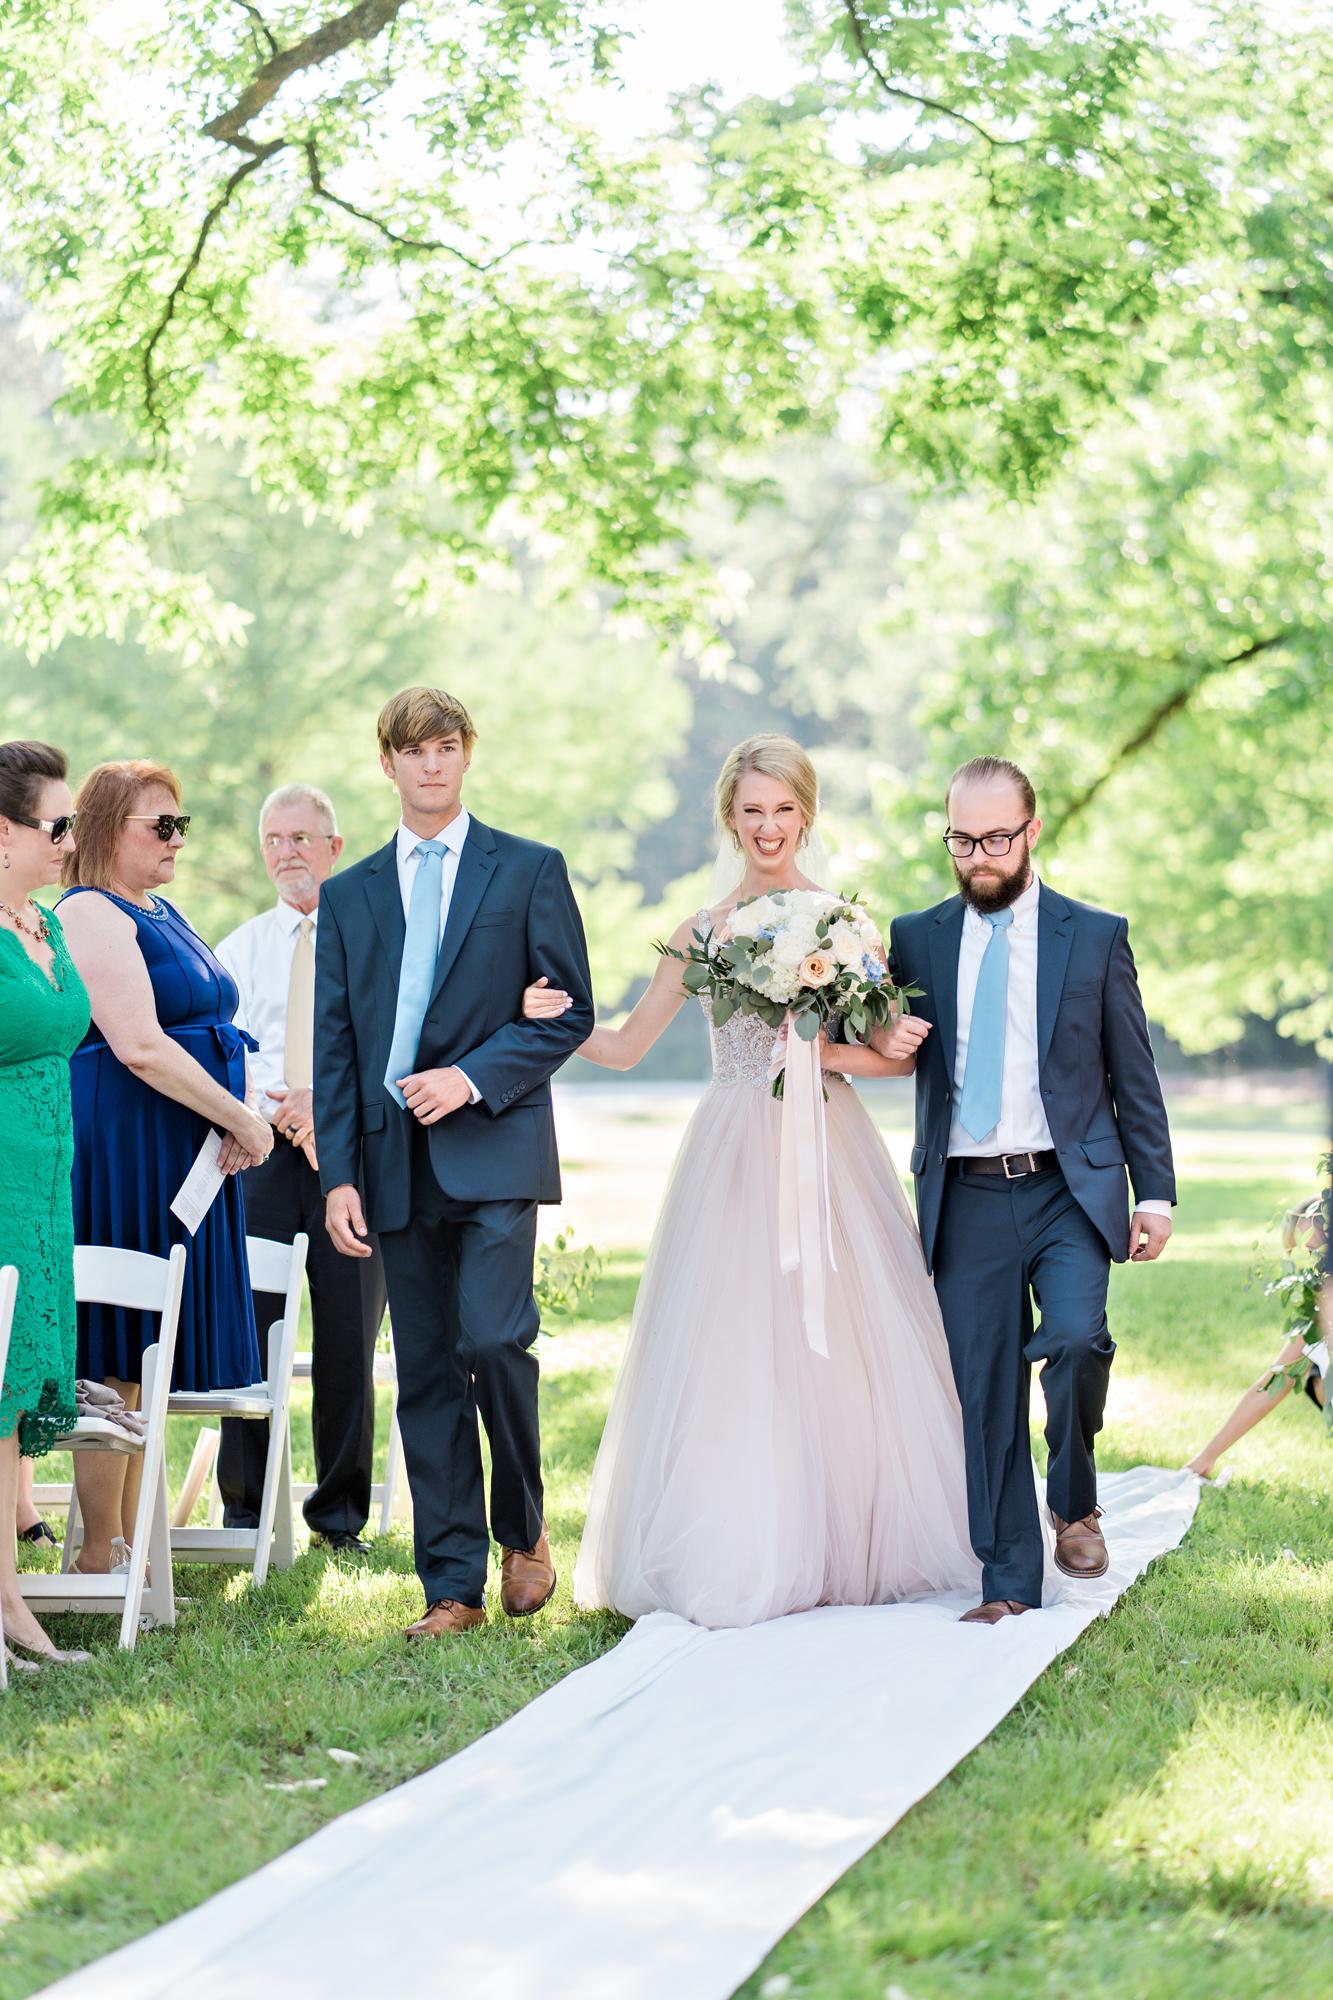 Alabama-Photographers-Nick-Drollette-Wedding-Photography-136.jpg